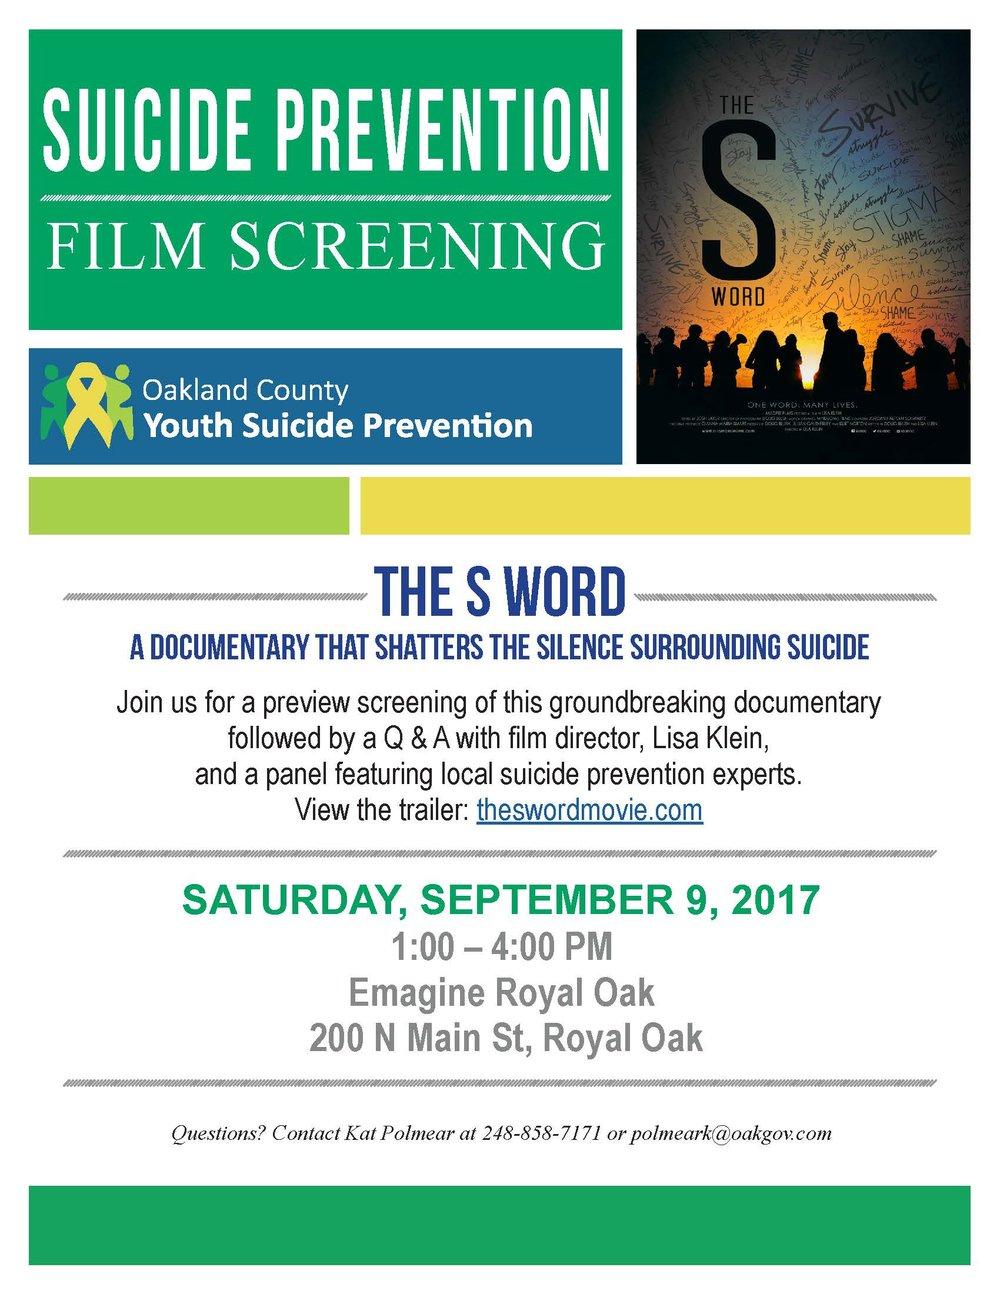 S Word Screening Flyer.jpg